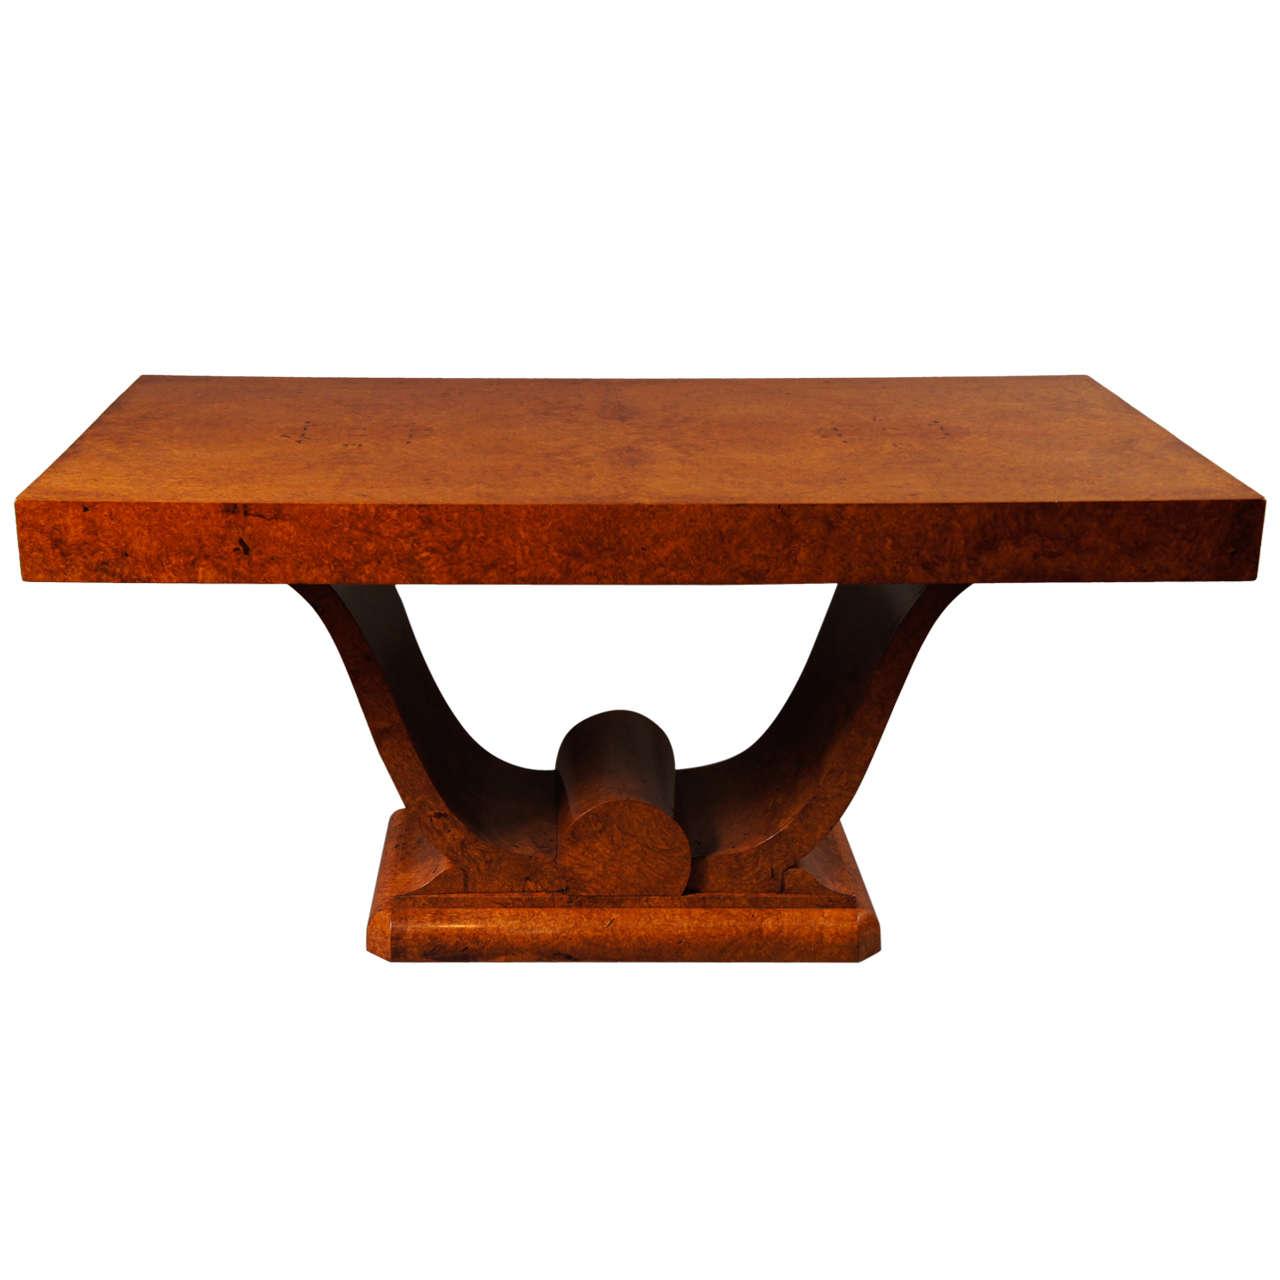 French Art Deco Amboyna Wood Table